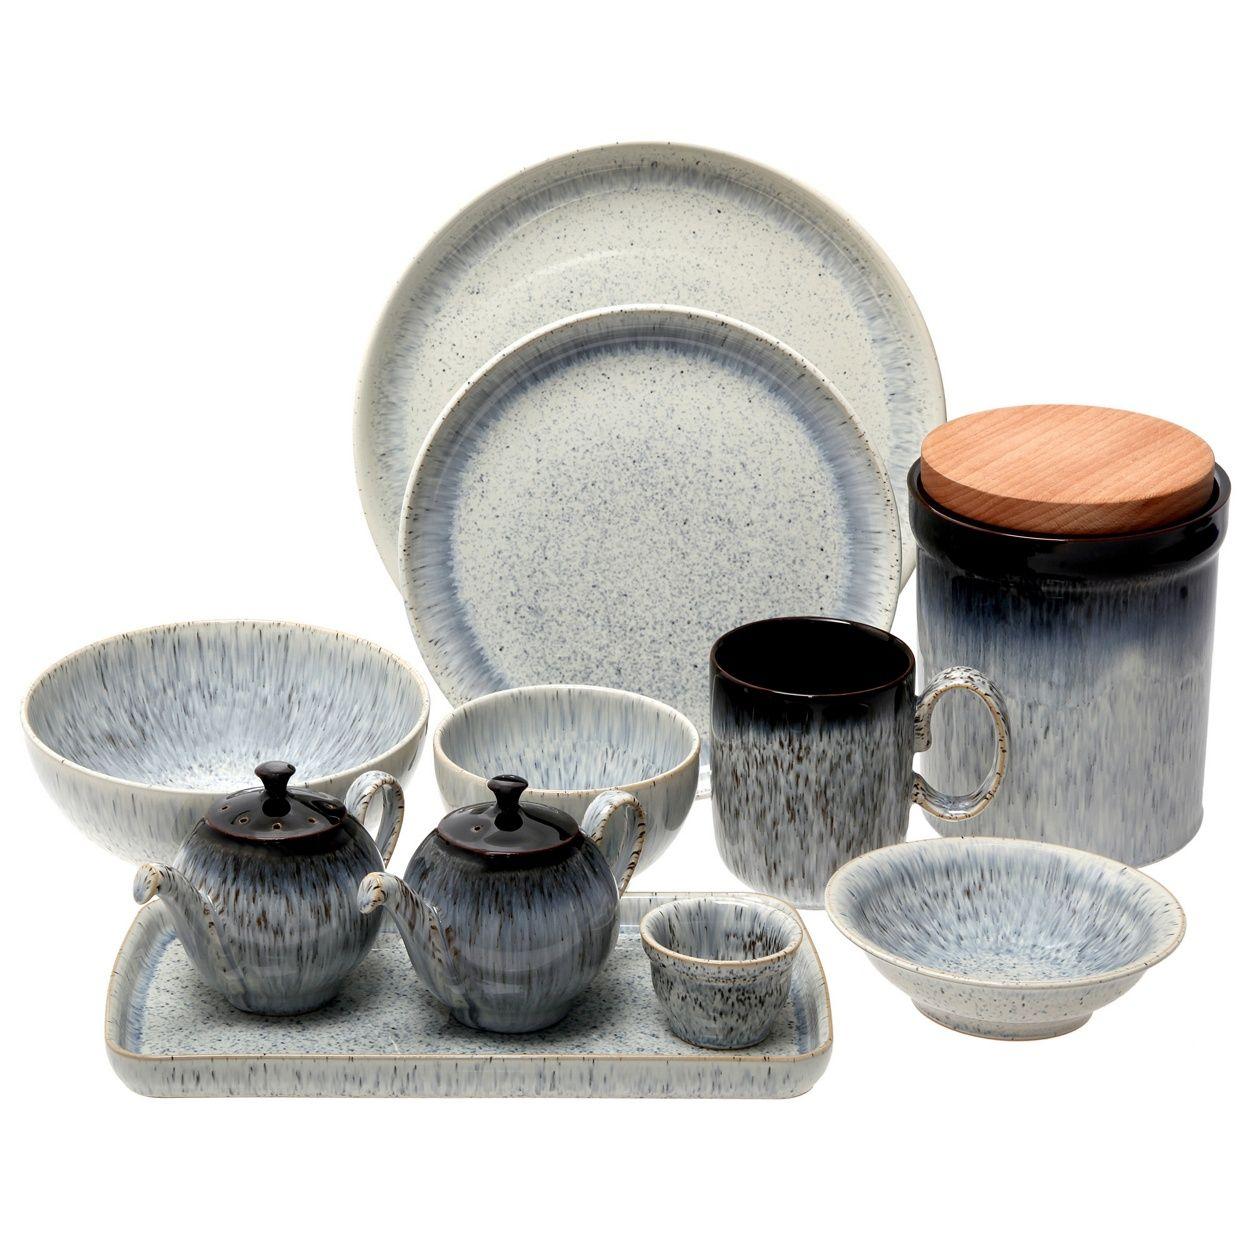 Denby u0027Halou0027 dinner plate - Plates - Dinnerware - Home u0026 furniture -  sc 1 st  Pinterest & Denby Denby u0027Halou0027 side plate- at Debenhams.com | Ceramics/Crockery ...